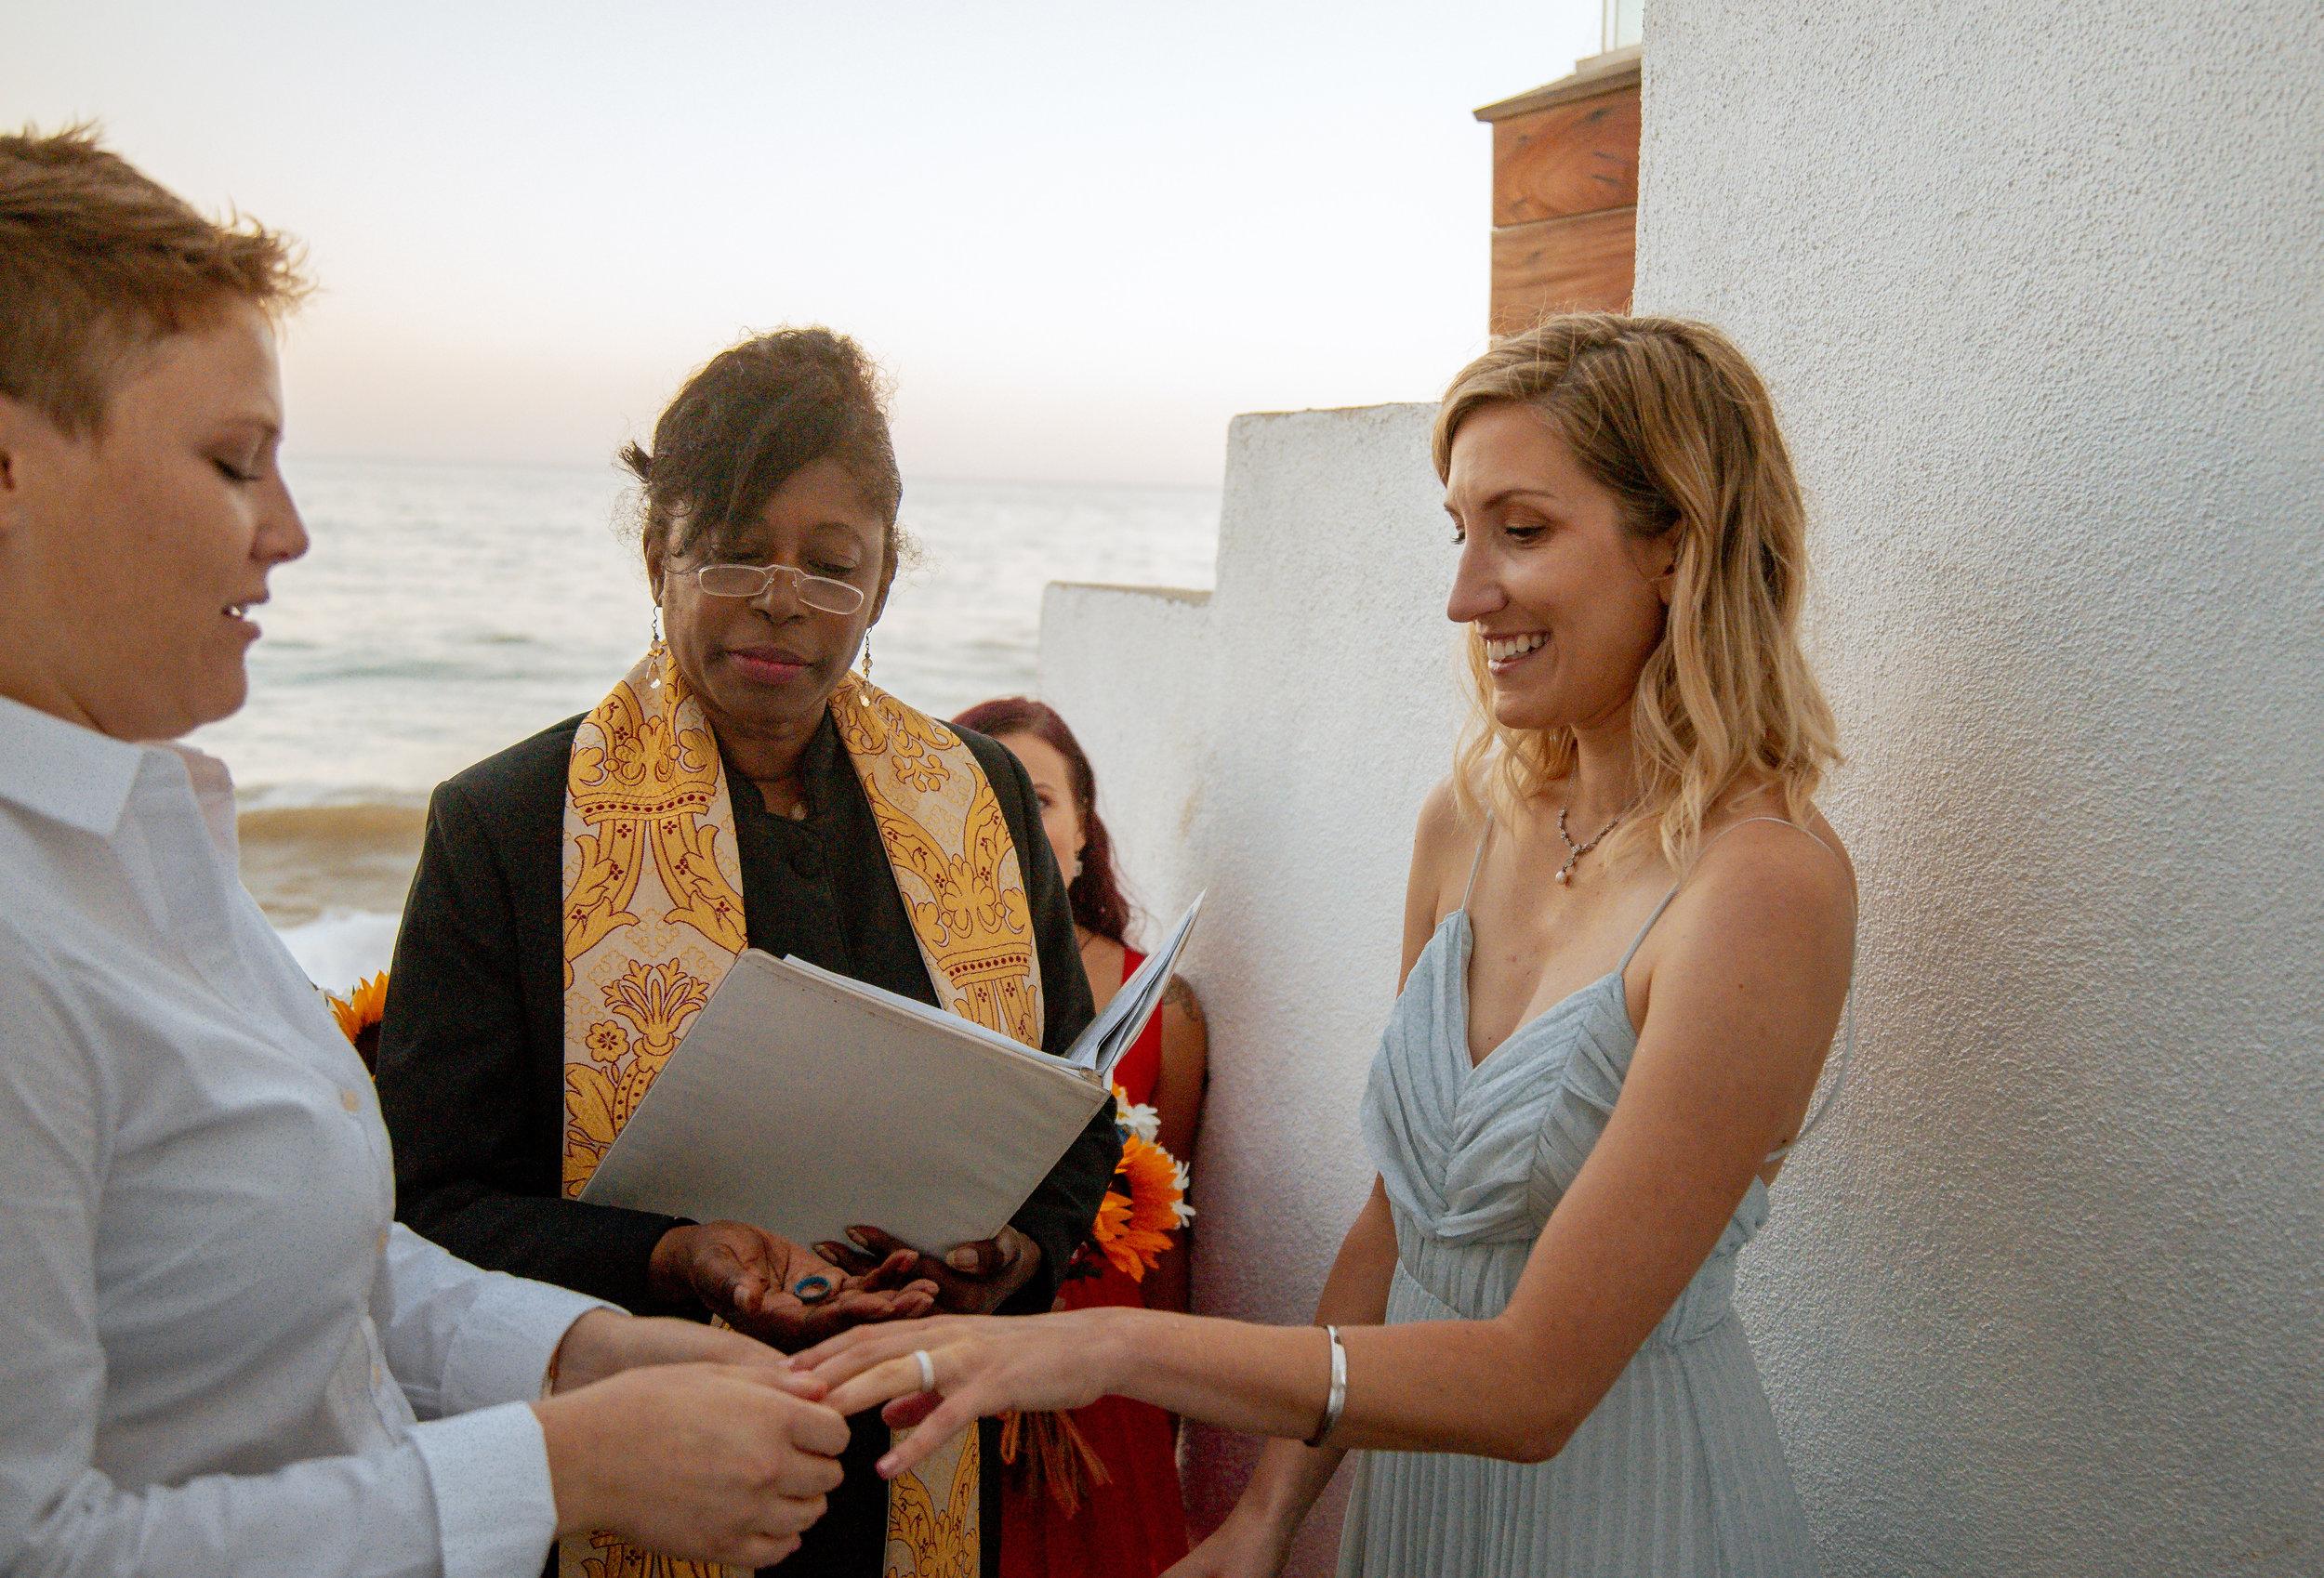 Hannah_&_Kates_Wedding_Oct_5th_2018_0_51.JPG